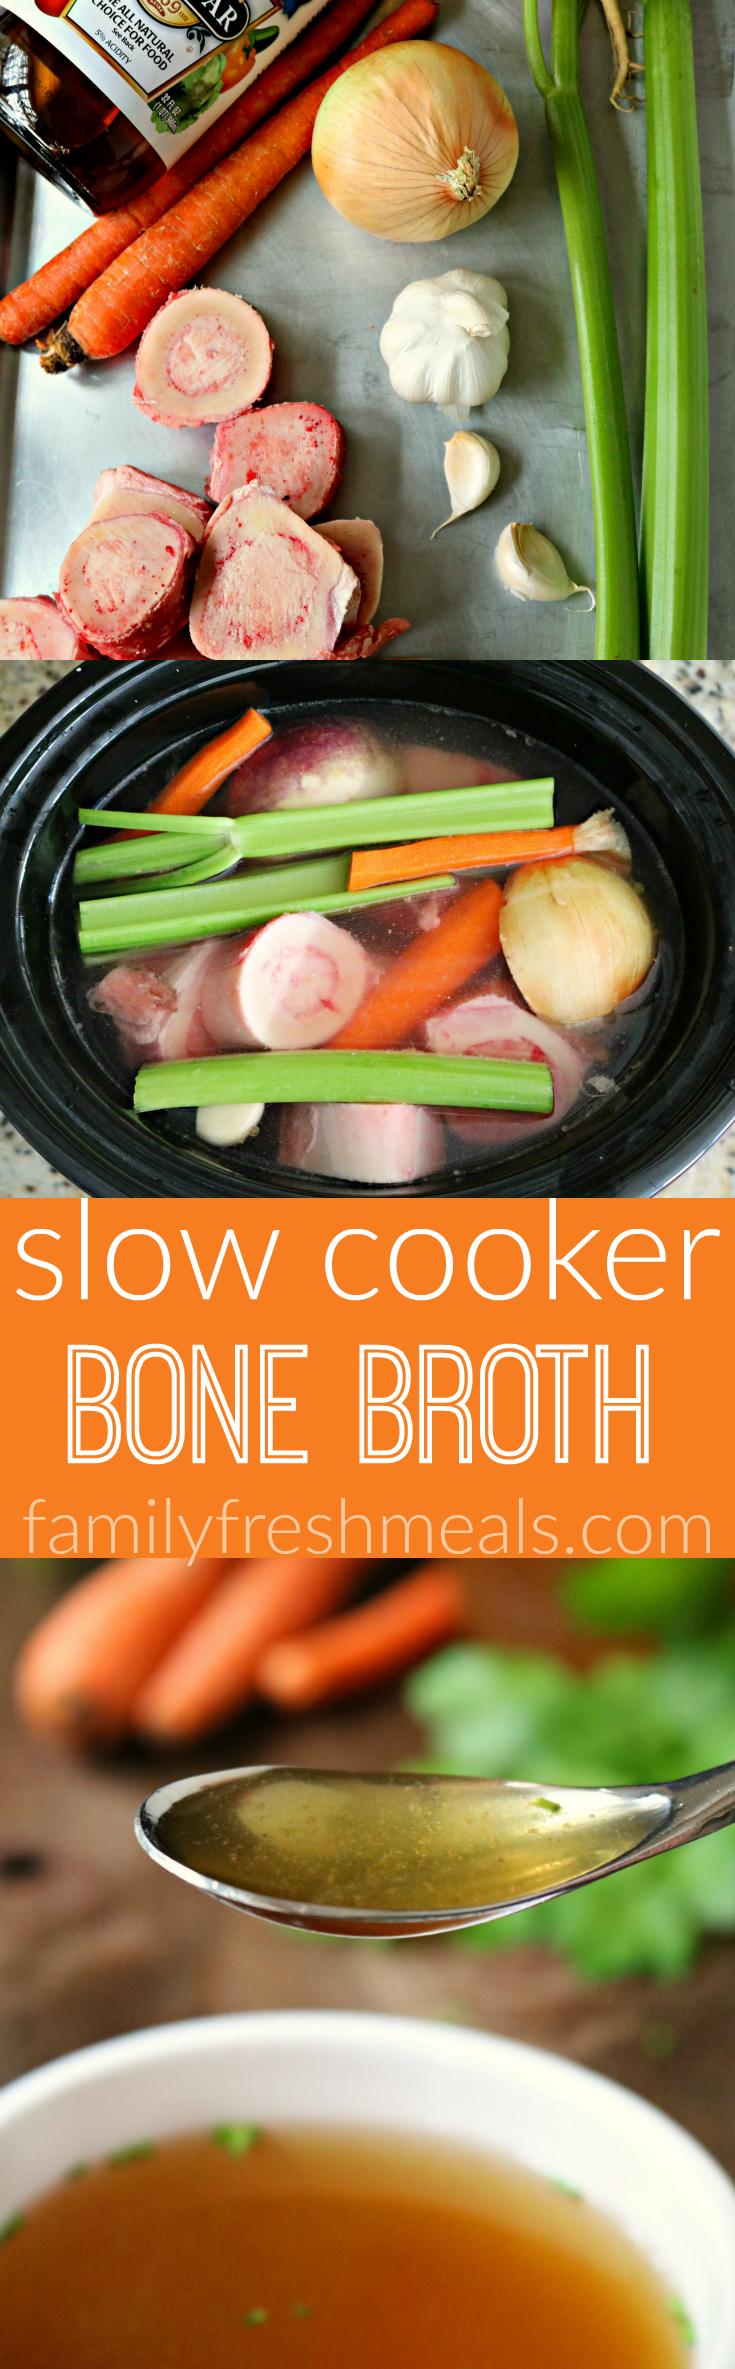 Slow Cooker Bone Broth -- FamilyFreshMeals.com -